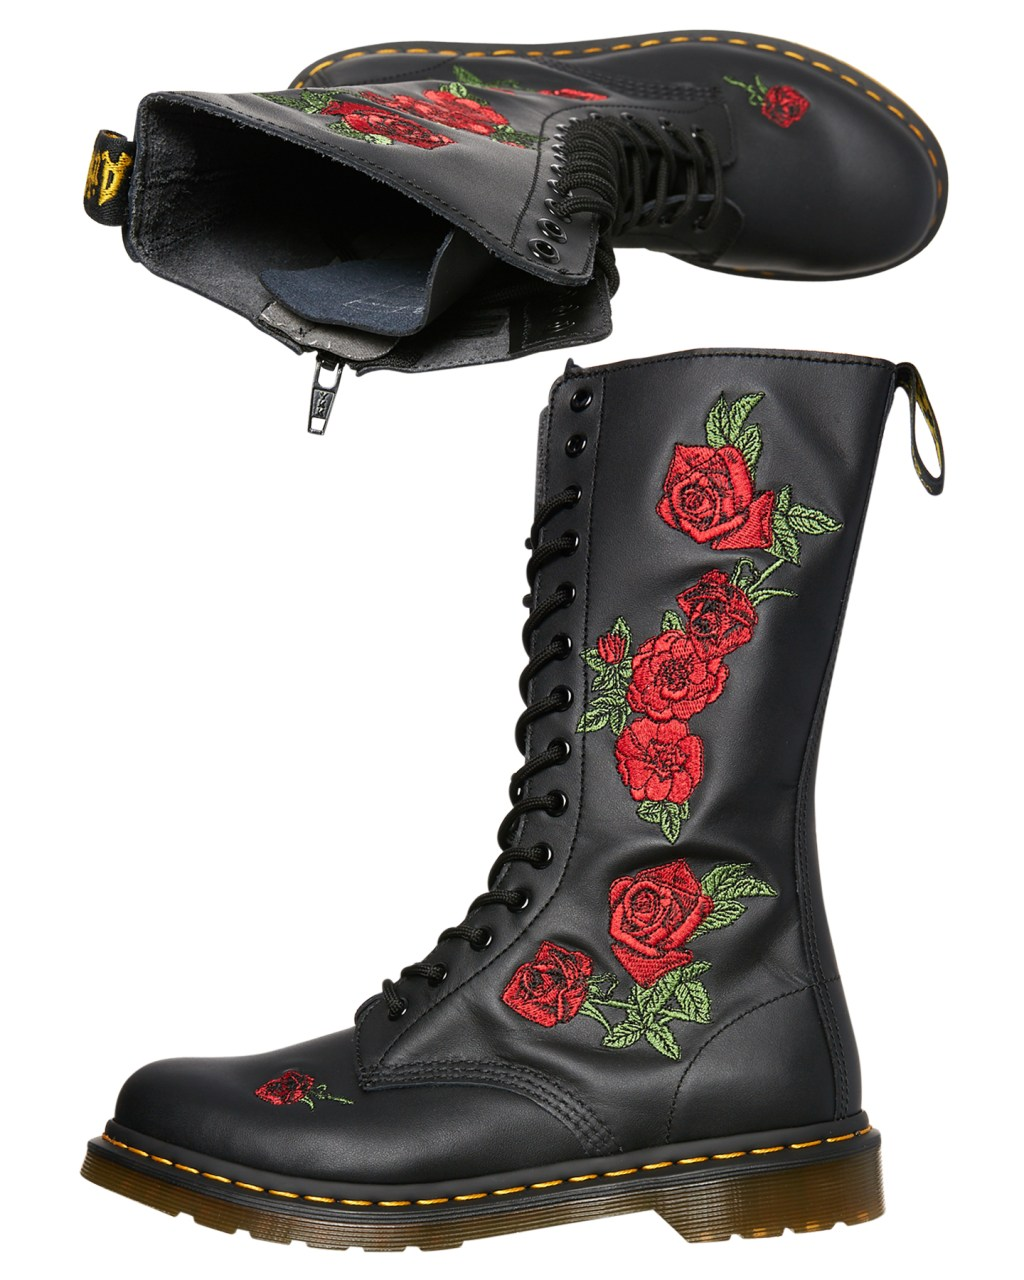 5b92808ef181 Dr. Martens Womens Vonda 14 Eye Boot Black Womens Boots Size 5 ...